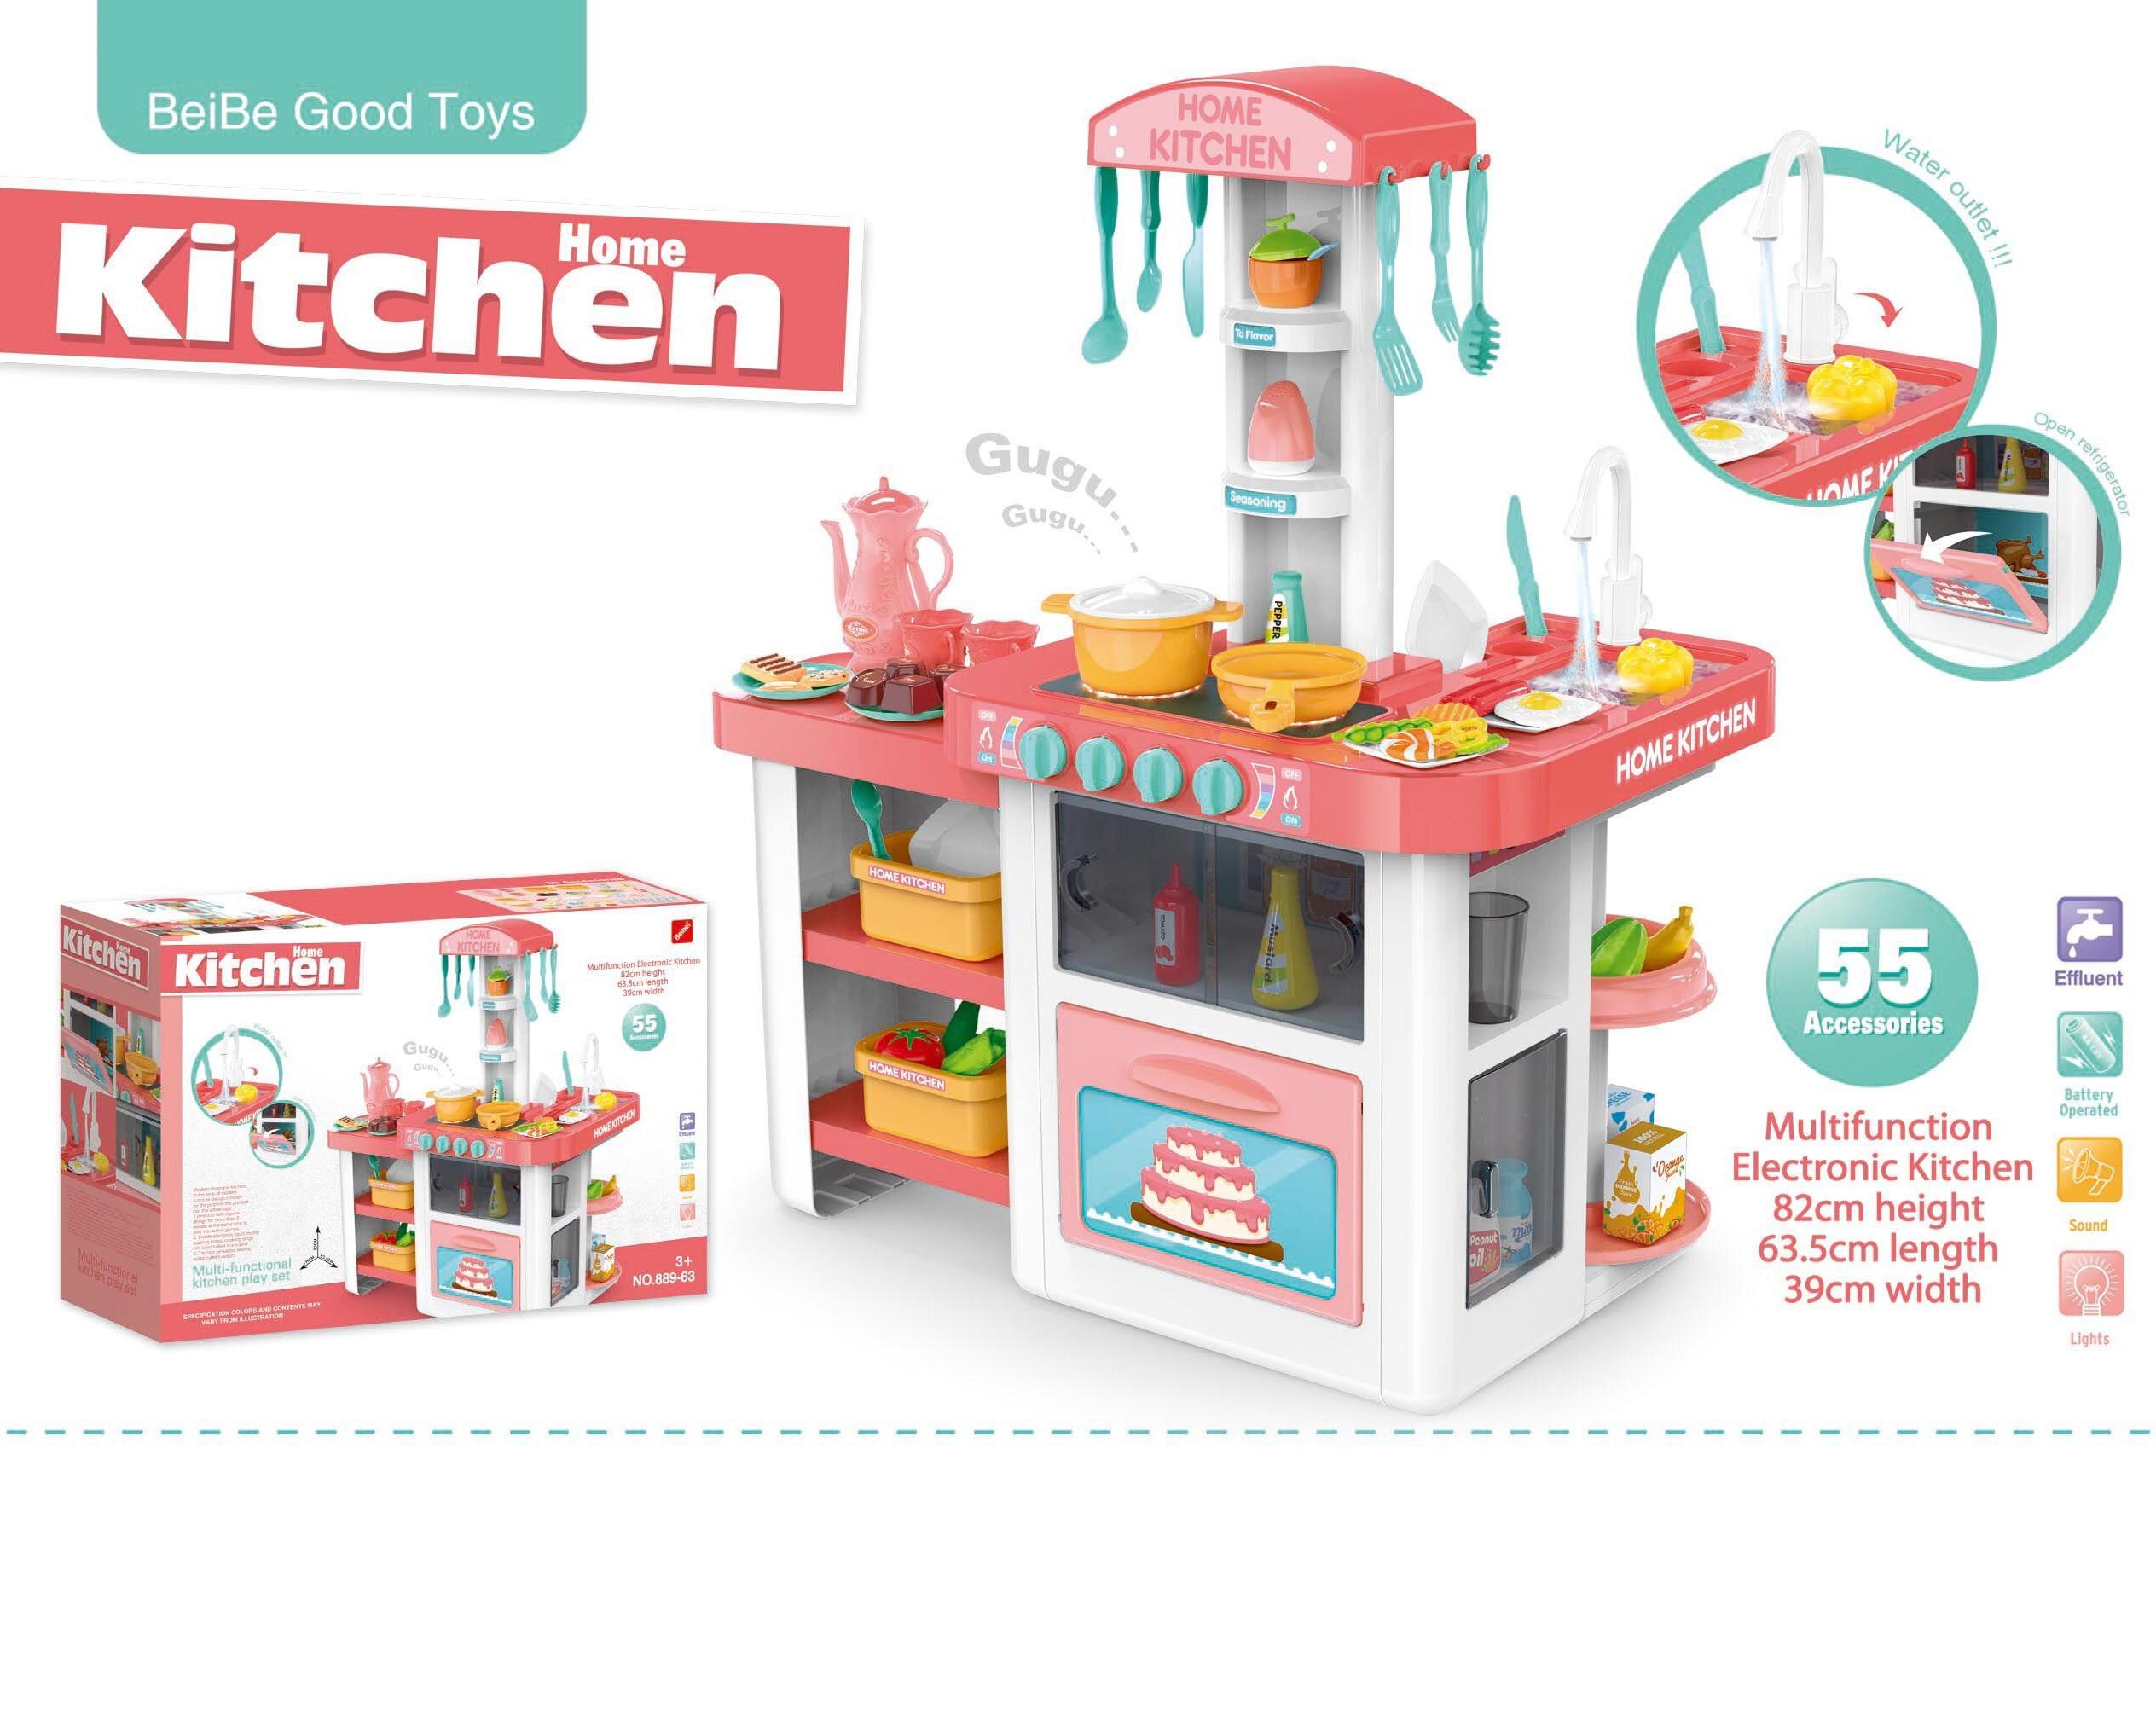 New Toys 2017 Child Toddler Toys Electronic Play Big Kitchen Set Toy For  Children Bpk01104 - Buy Toddler Toys,Child Toy,Big Kitchen Set Toy Product  on ...